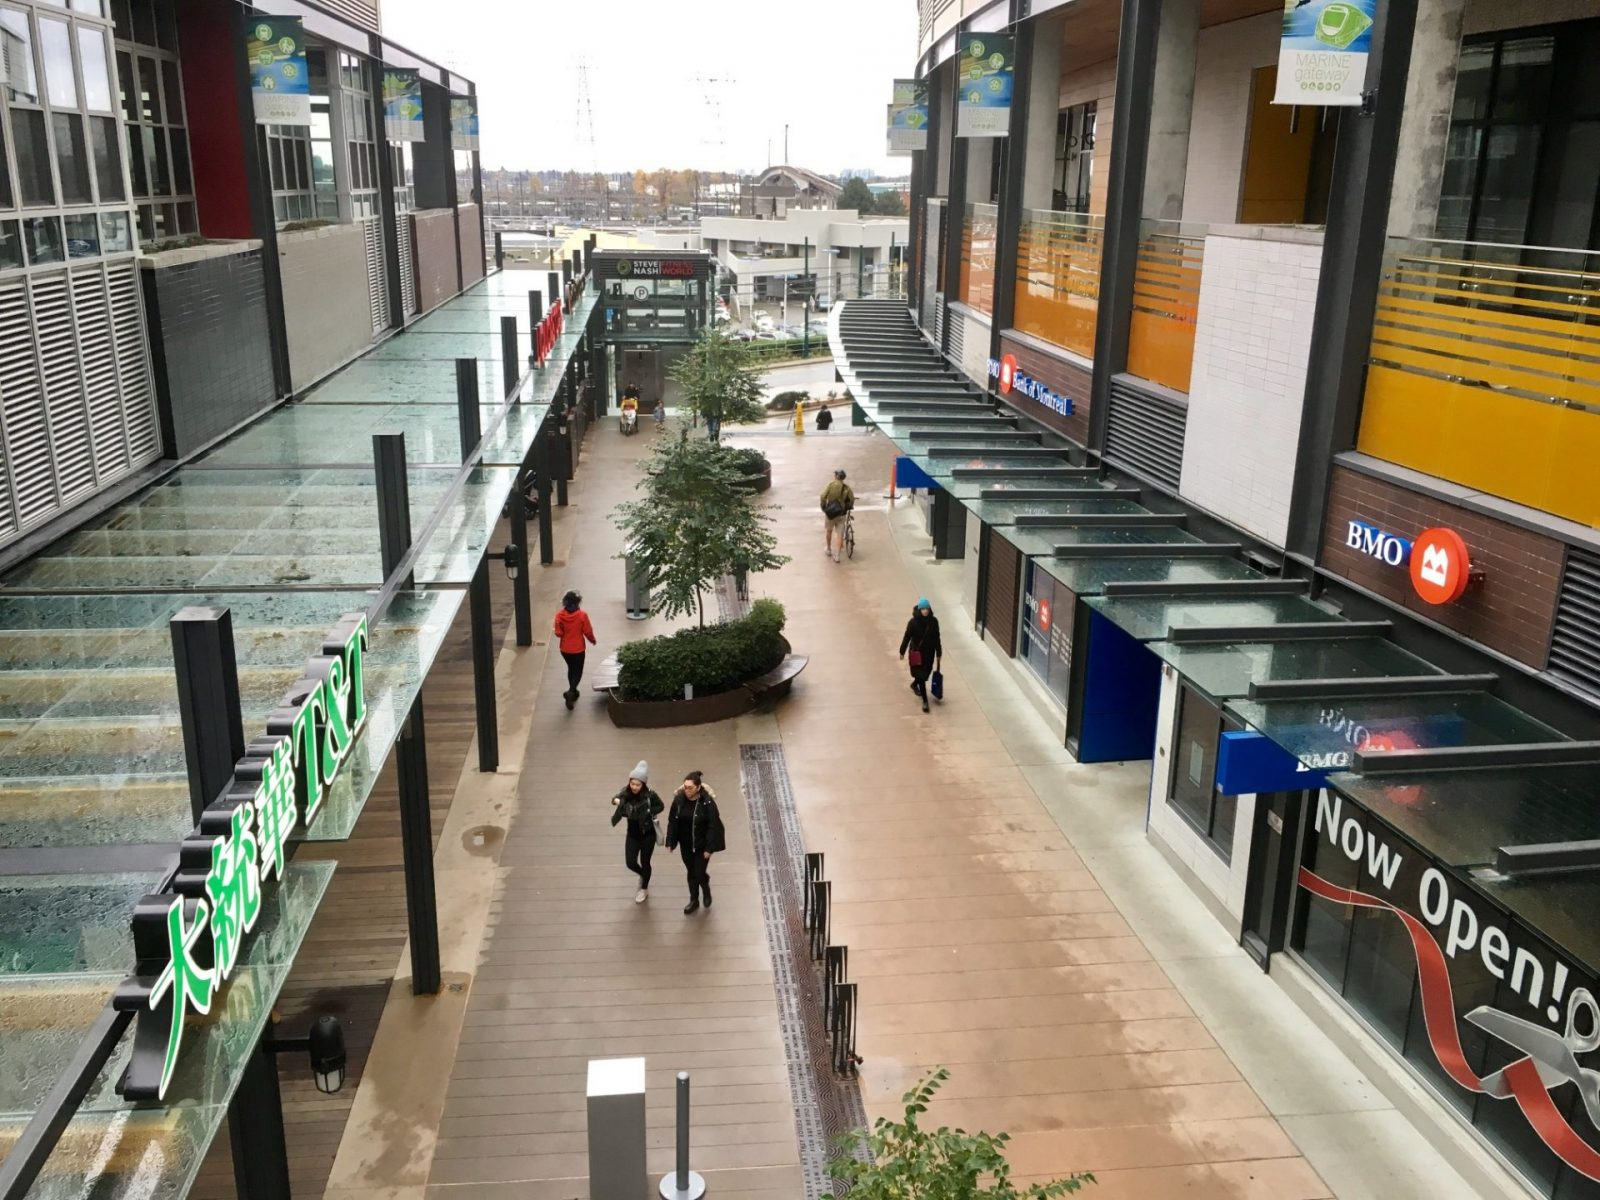 Marine Gateway offers Cineplex theatre, T&T, and condos